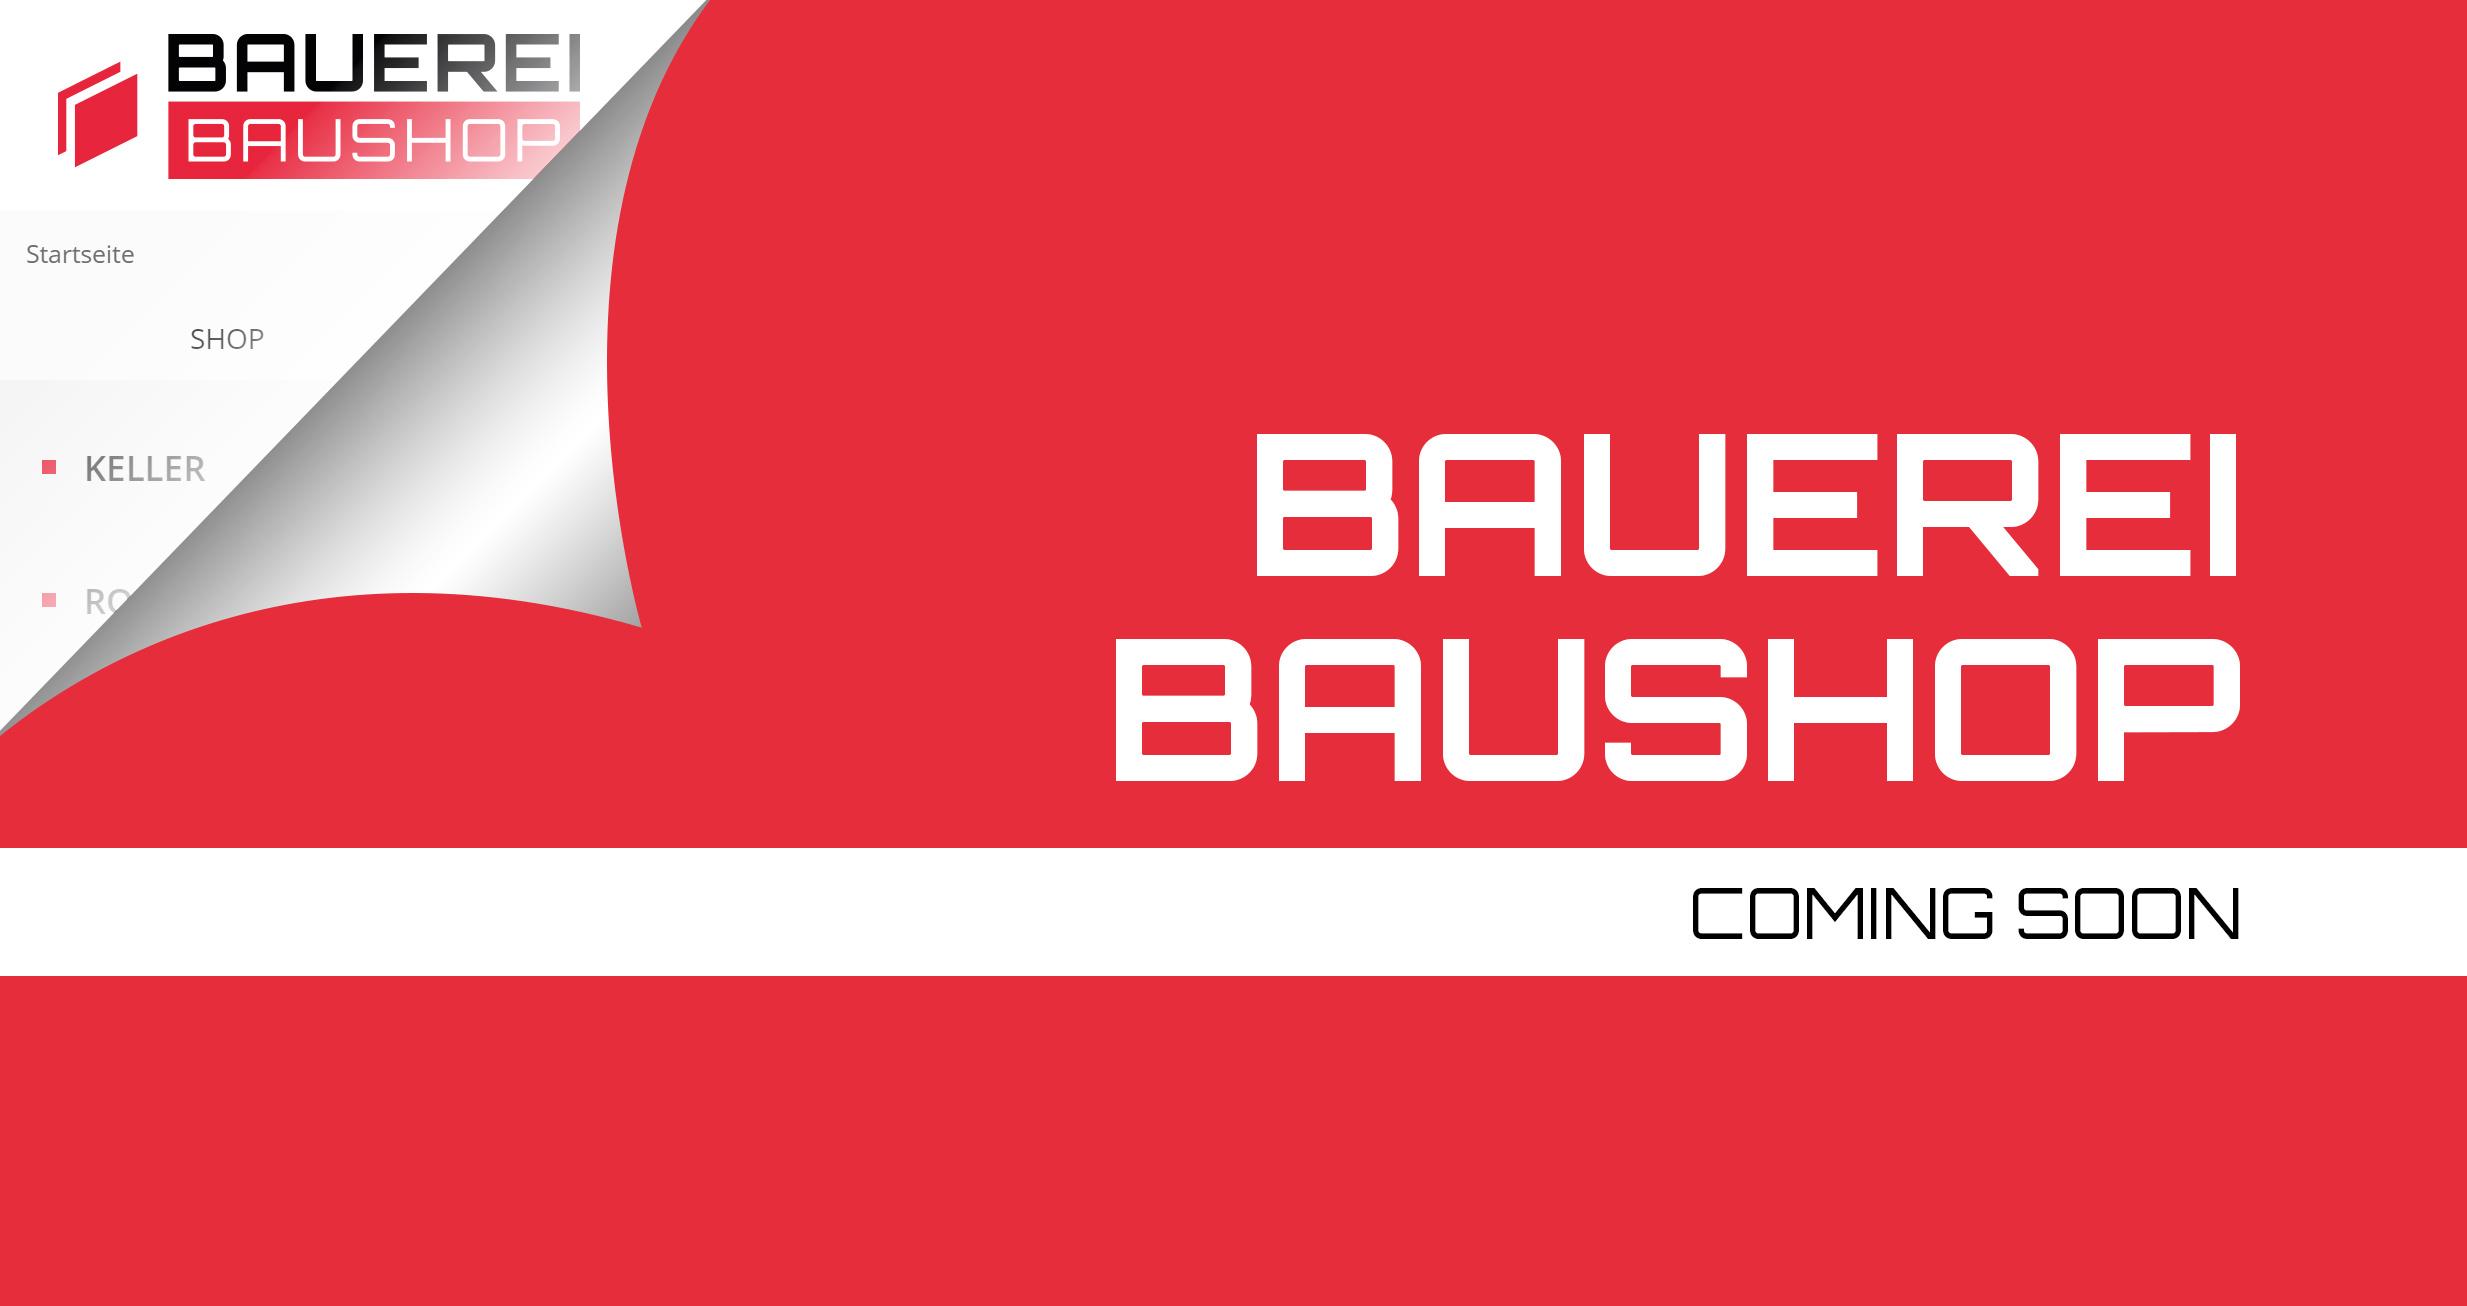 Bauerei Baushop